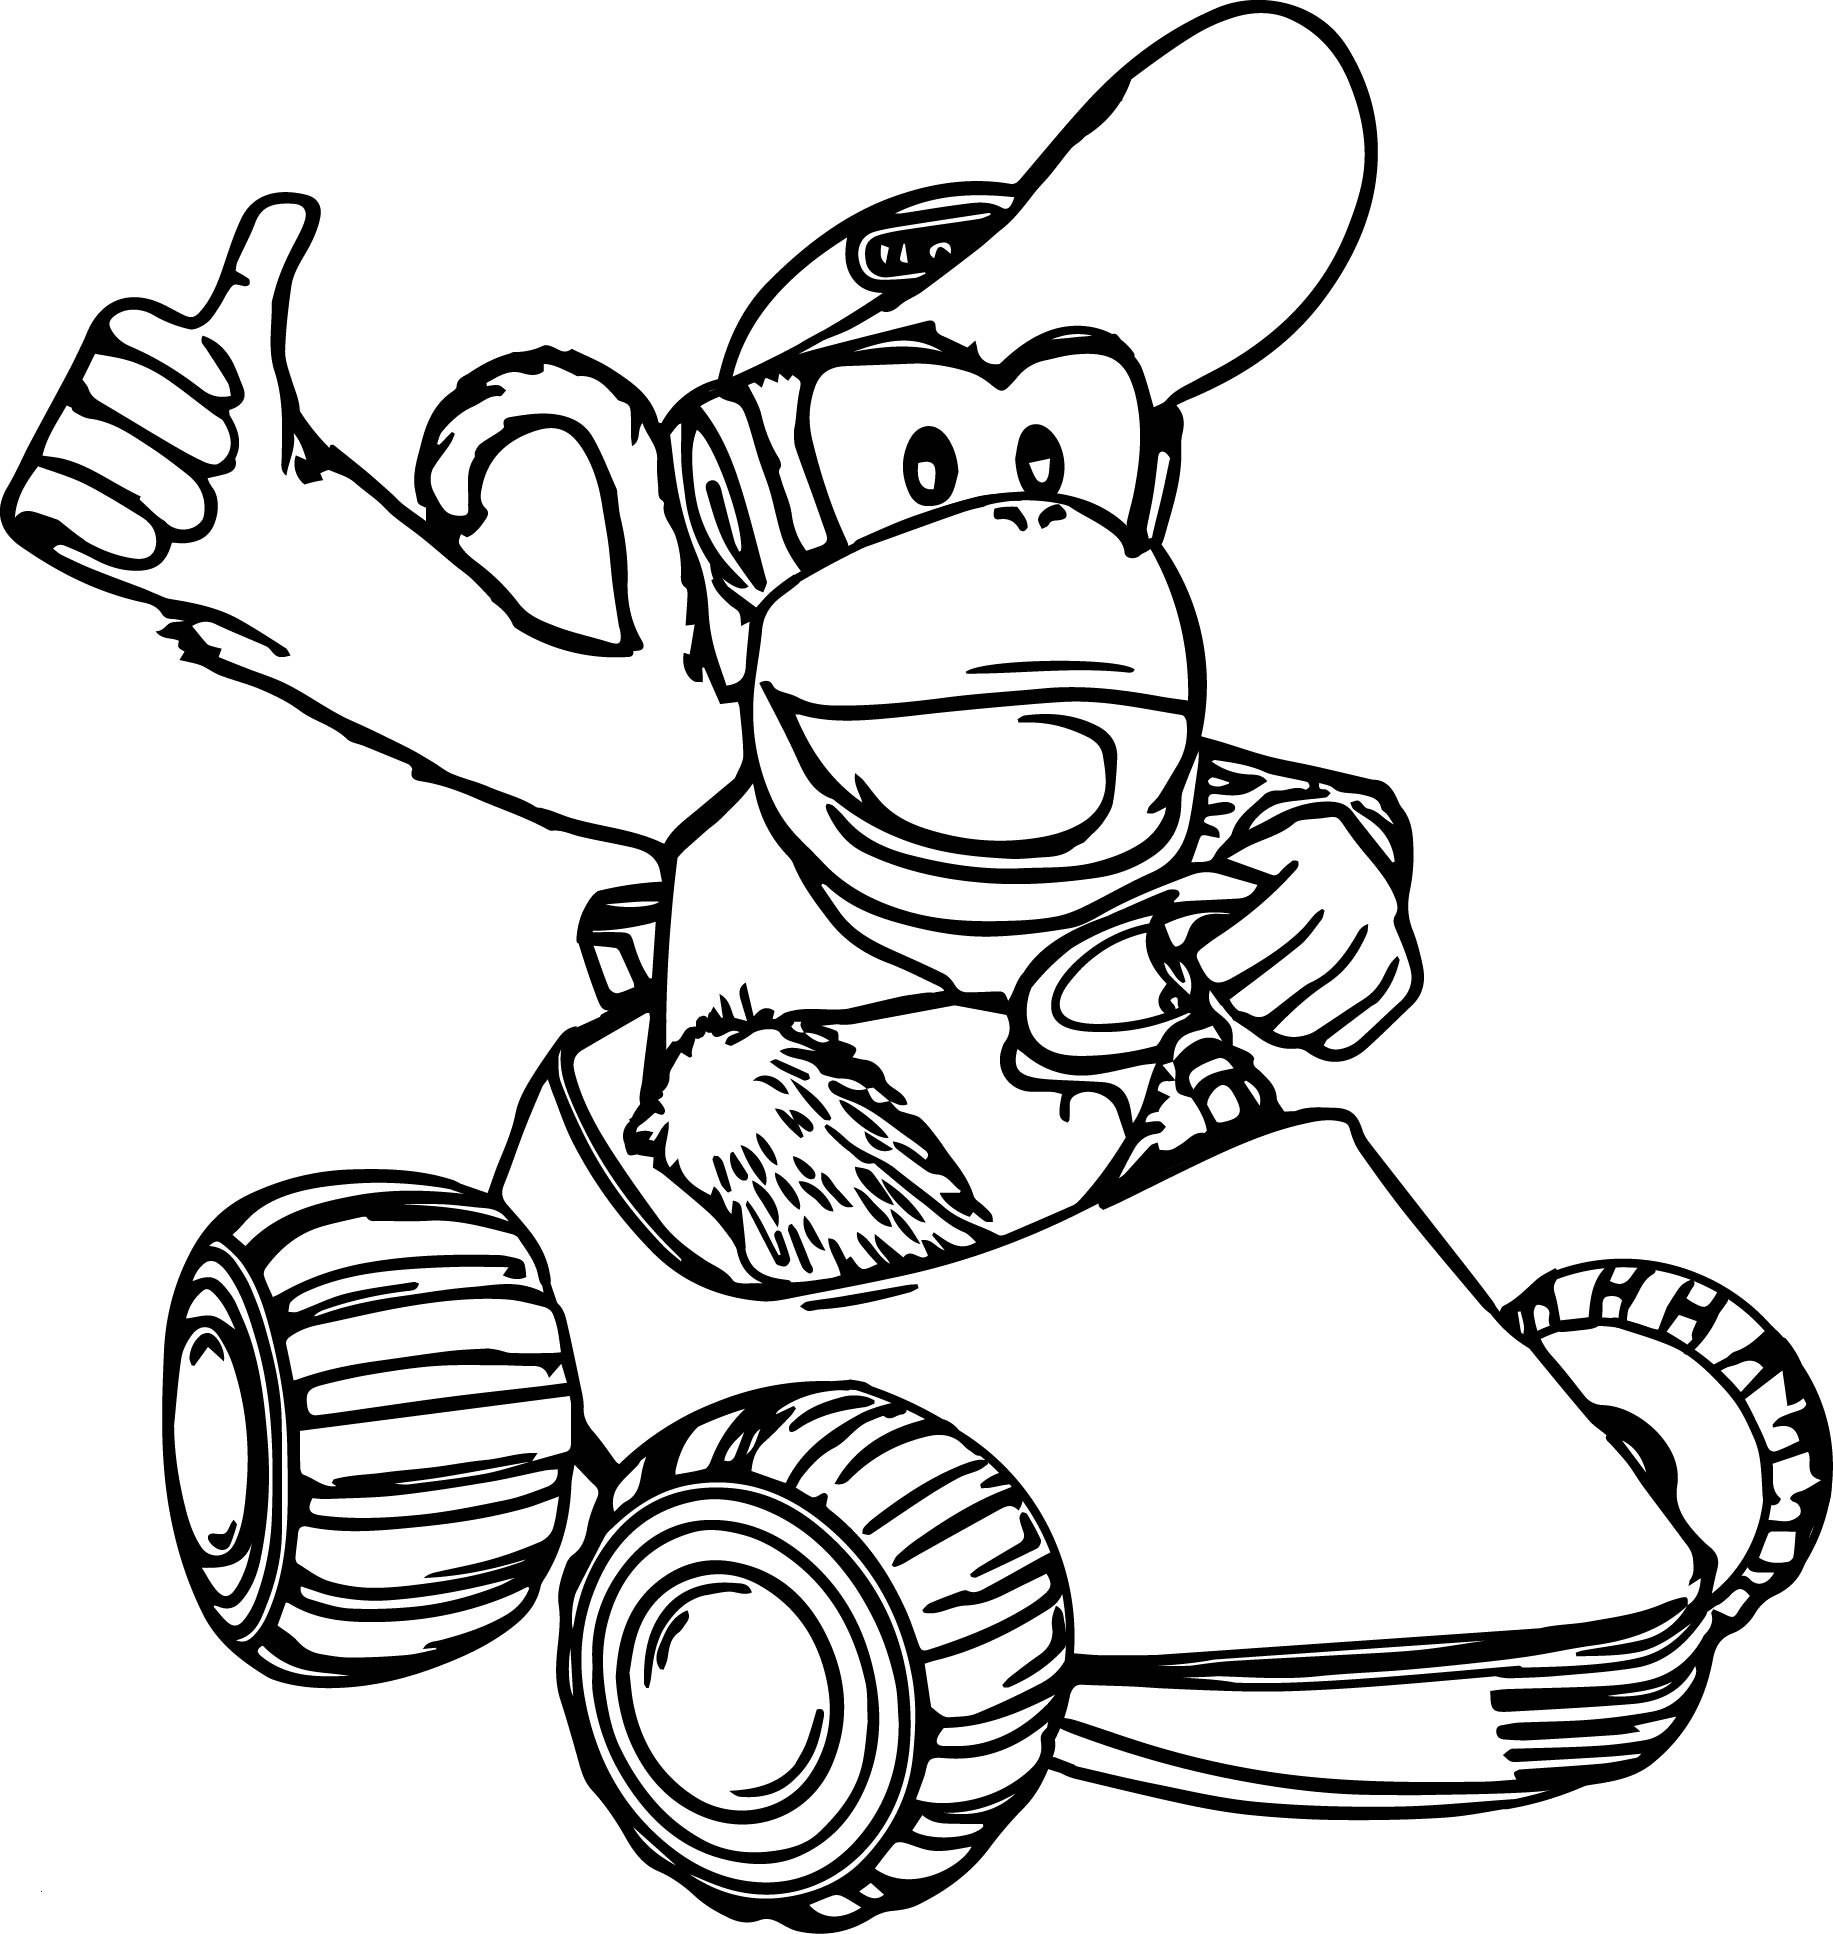 Mario Kart Ausmalbild Einzigartig Mario Bros Ausmalbilder Neu 37 Super Mario Kart Ausmalbilder Fotografieren